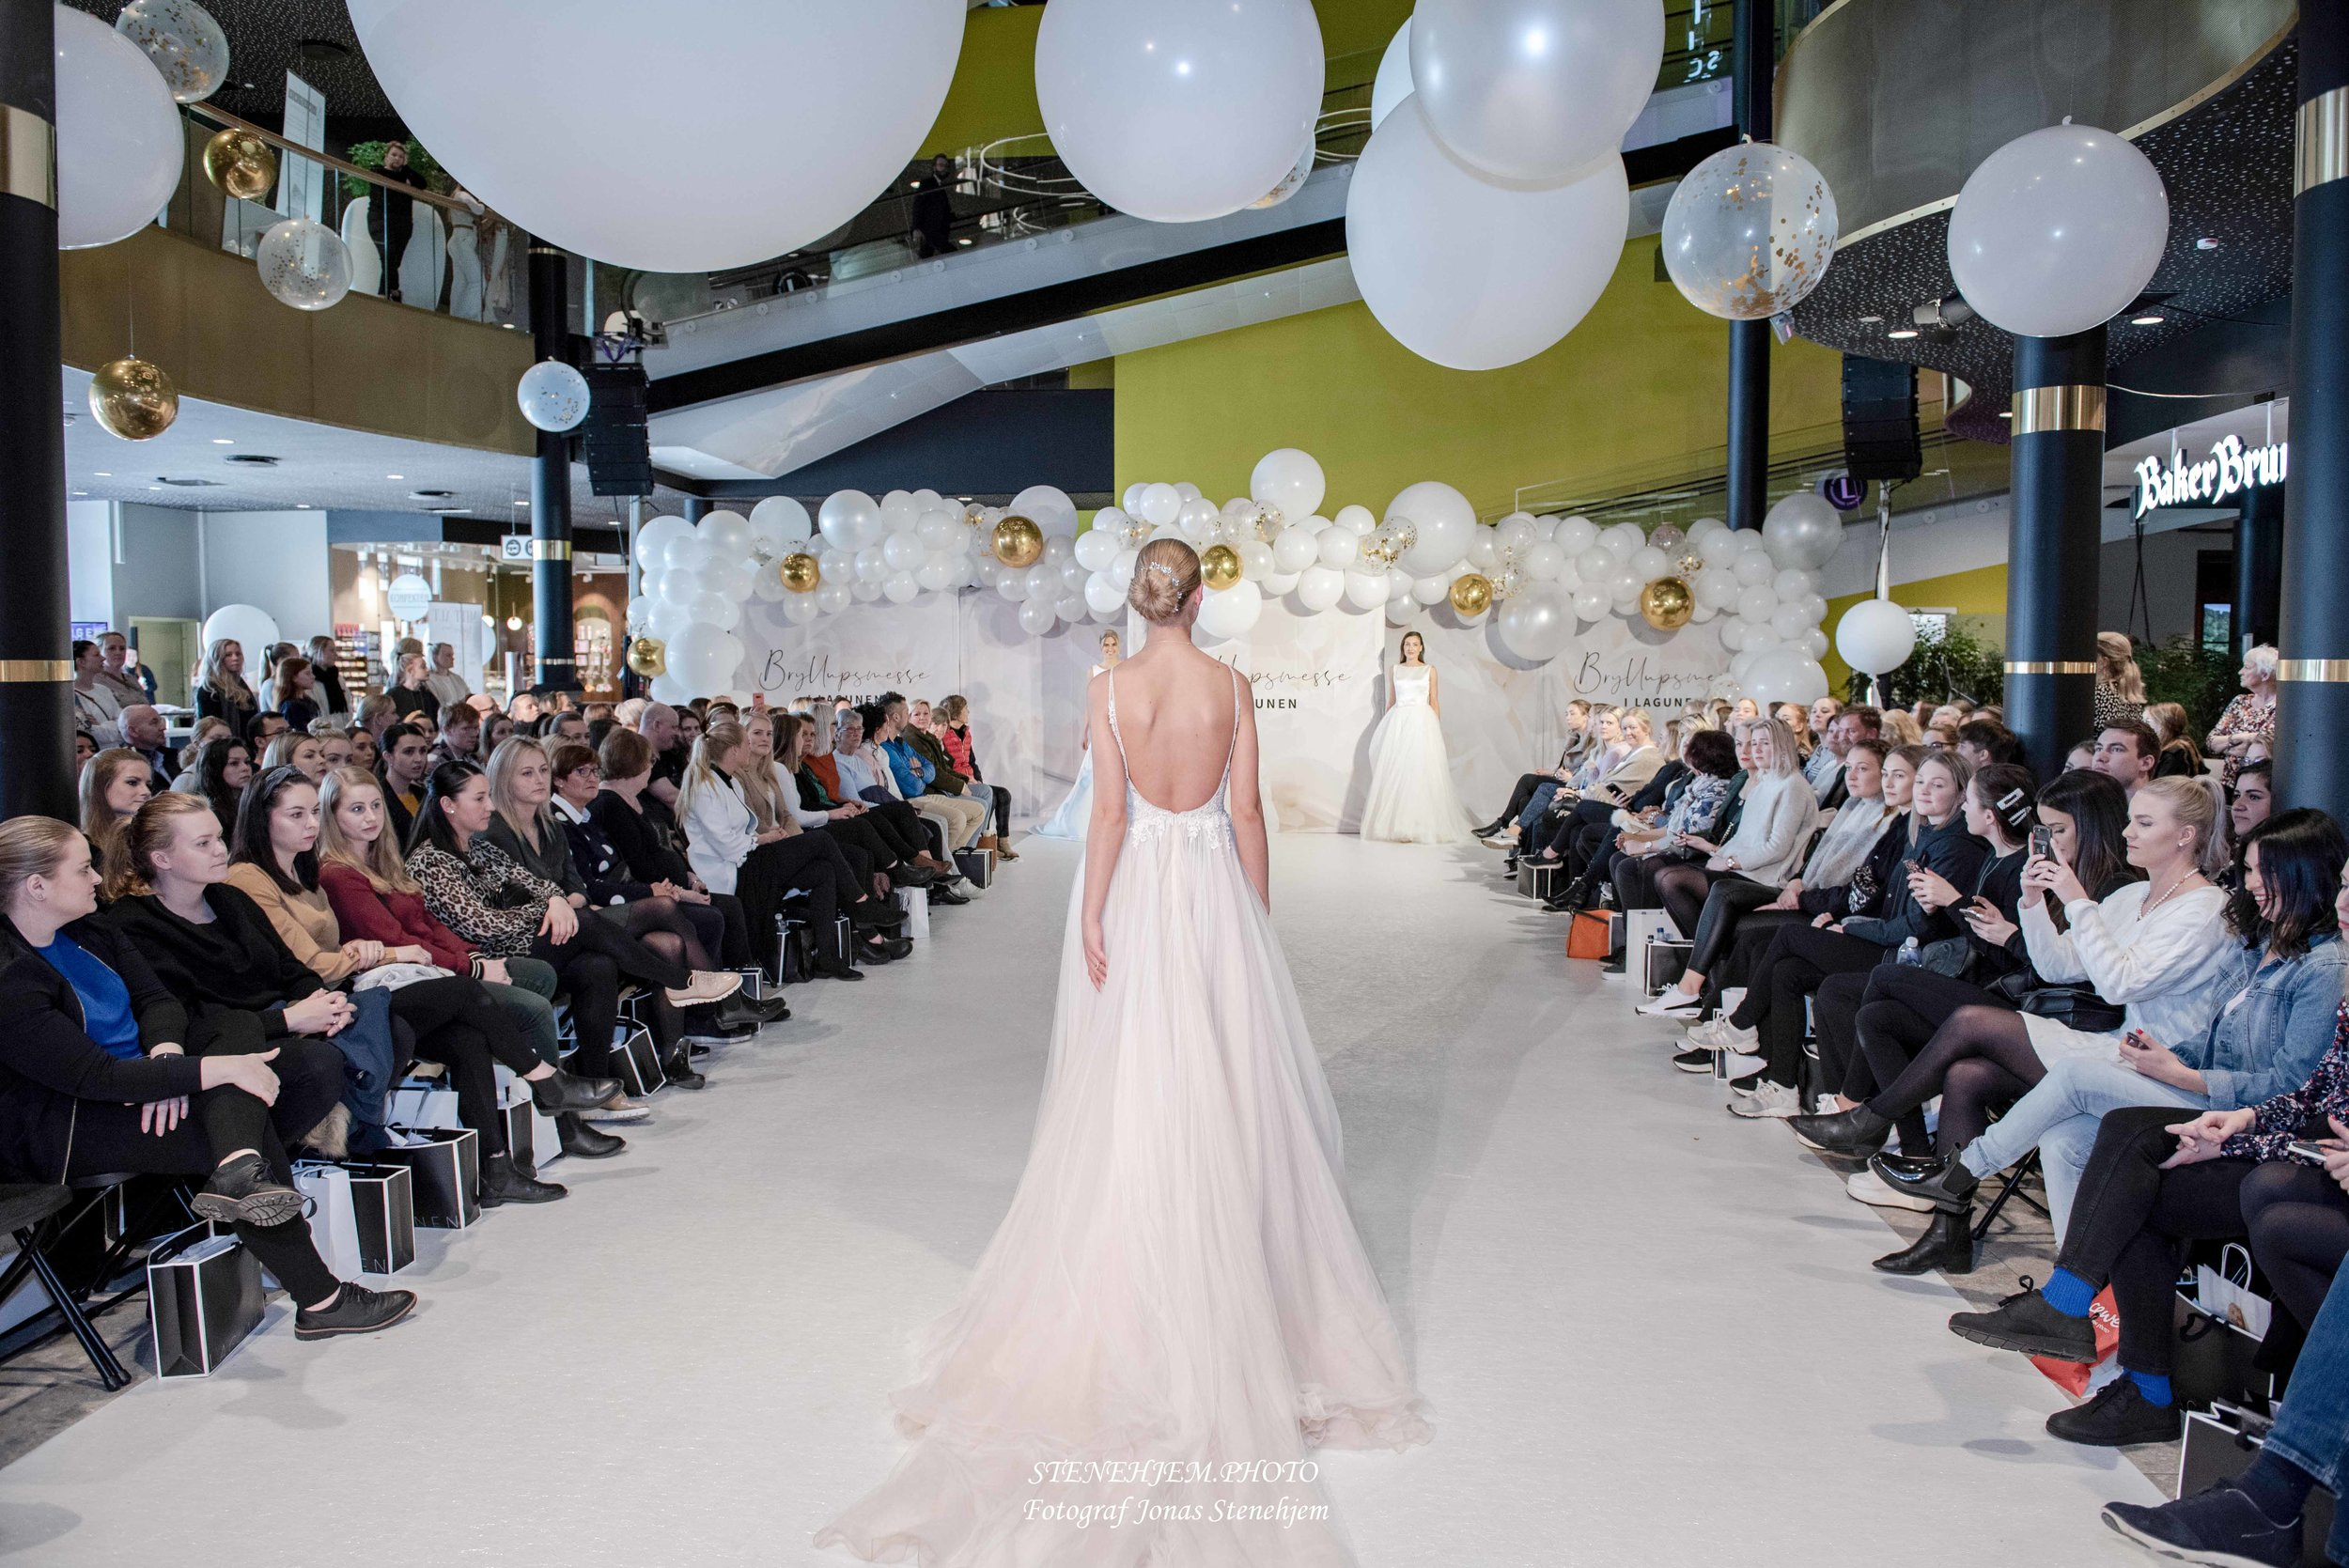 Bryllupsmesse_Lagunen_mittaltweddingfair__083.jpg